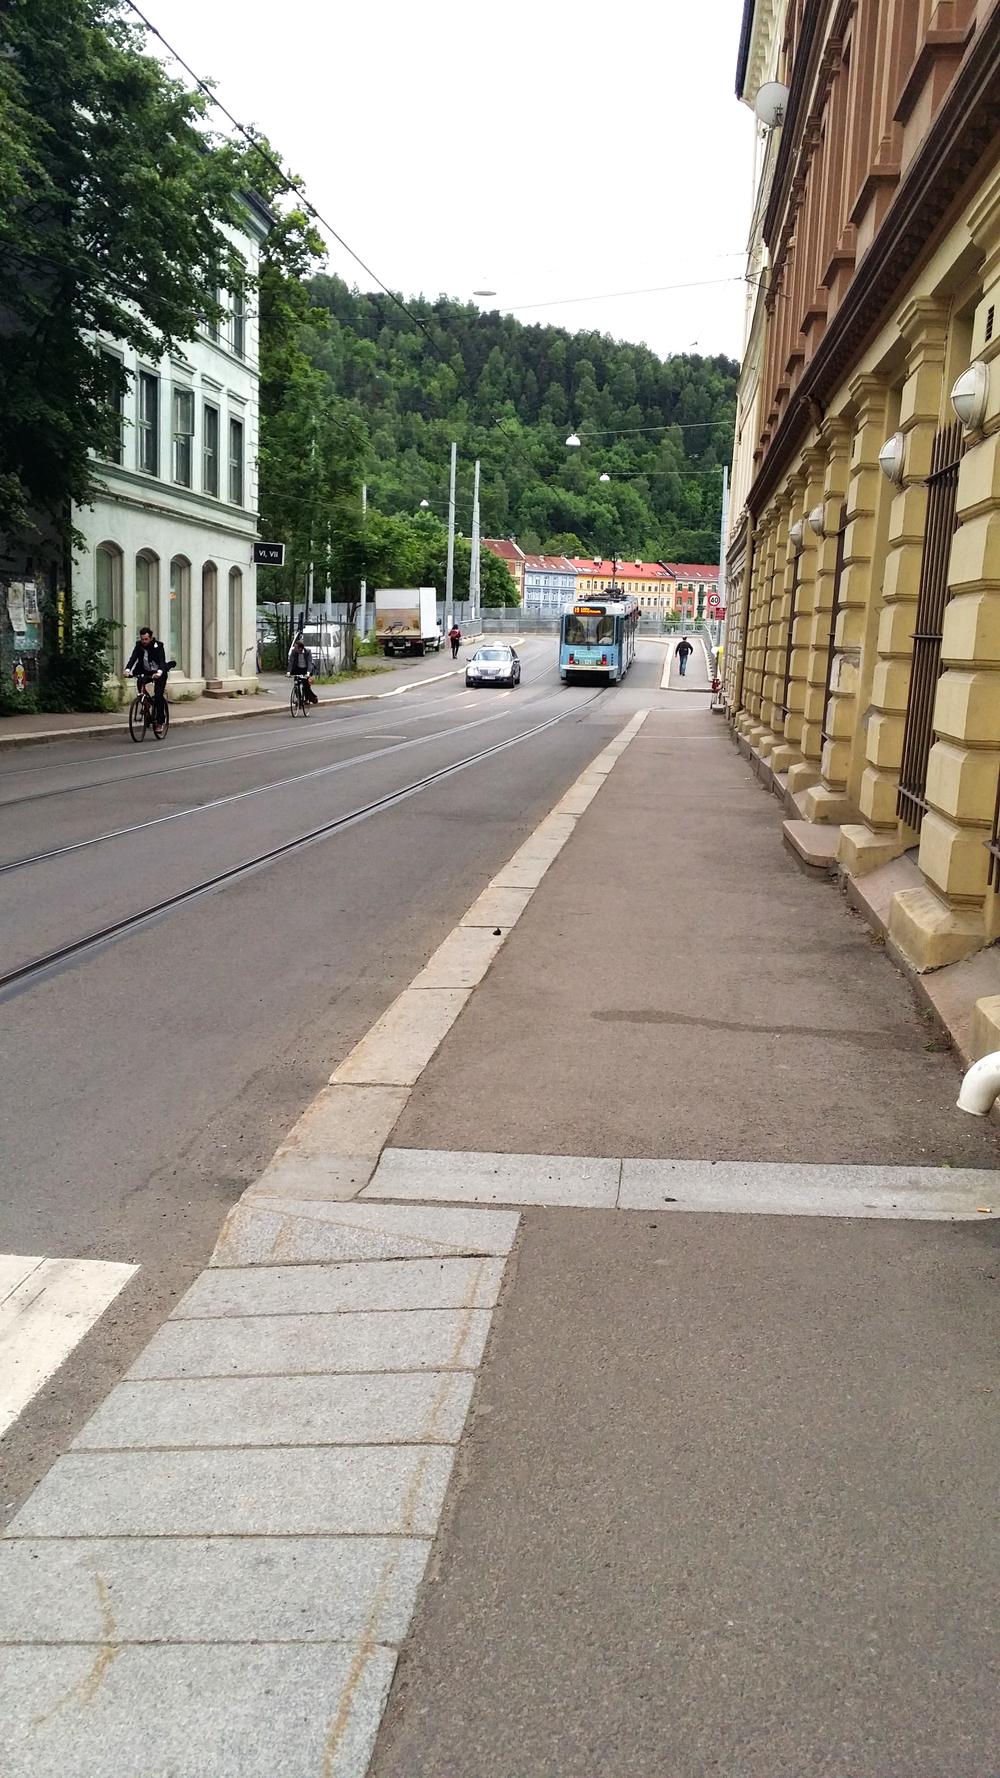 Jernbanelinje eller hovedtrasè for syklister?foto: Bendik Thun